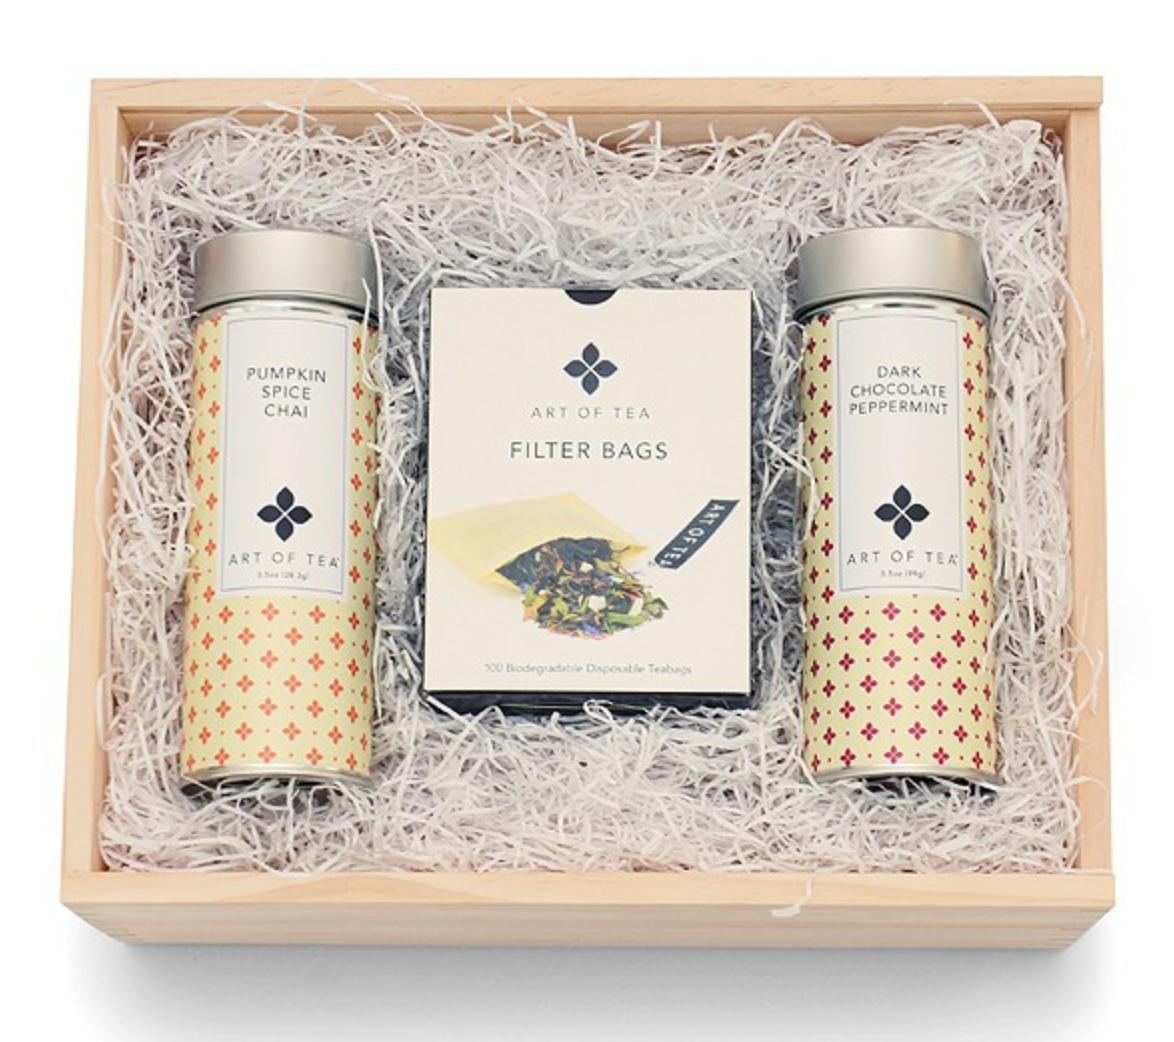 Art of Tea Gift Set